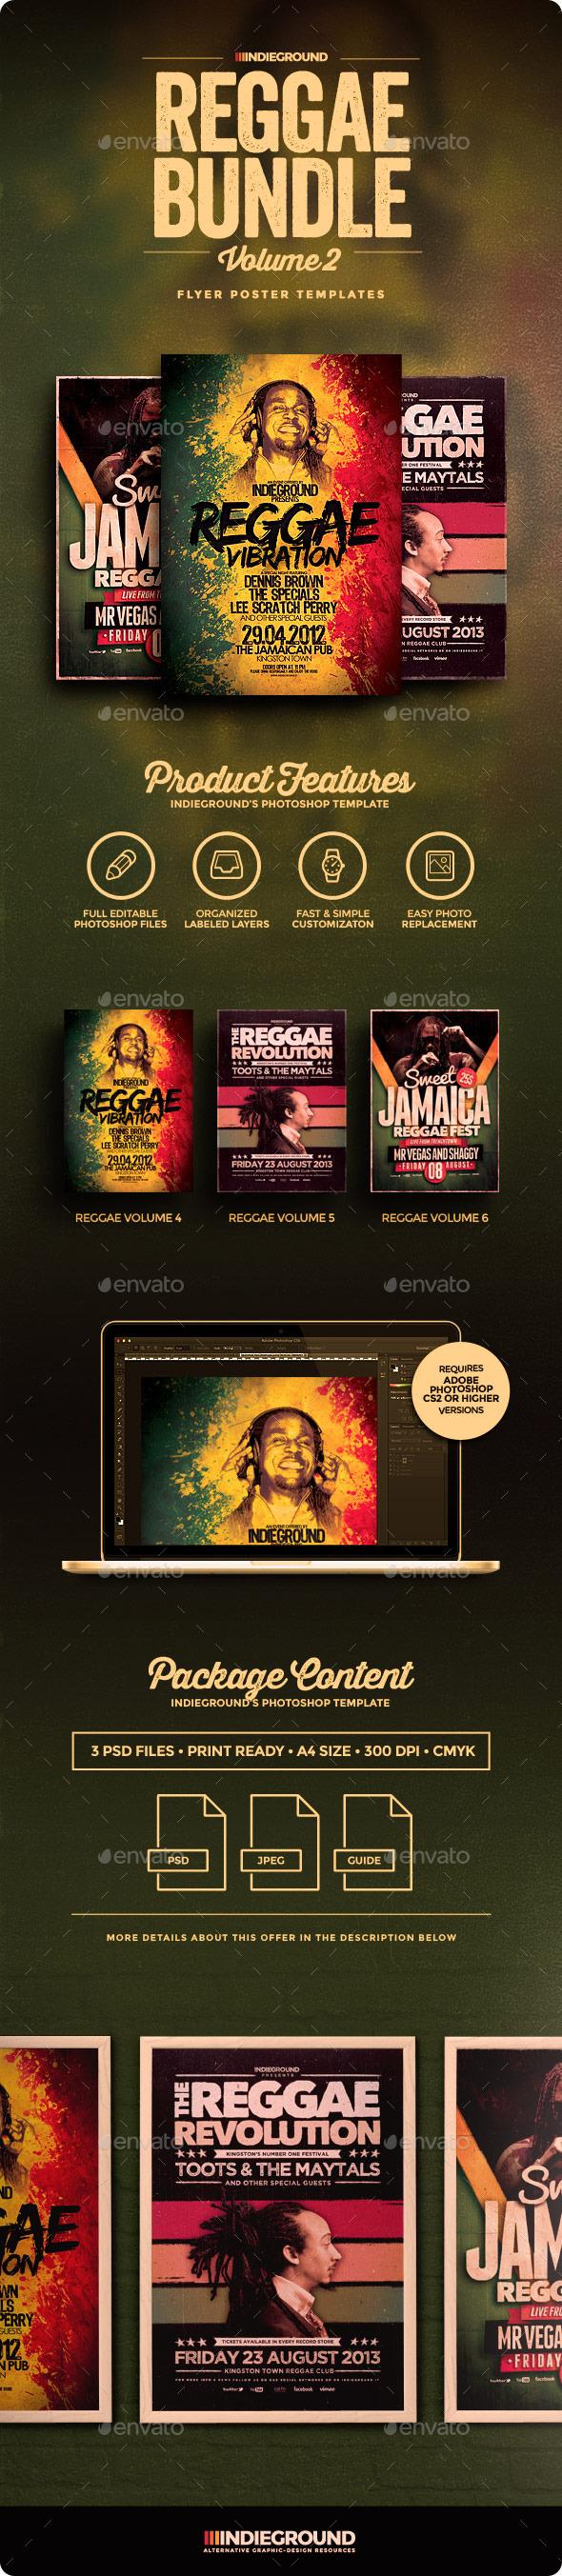 Reggae Flyer/Poster Bundle Vol. 4-6 - Events Flyers